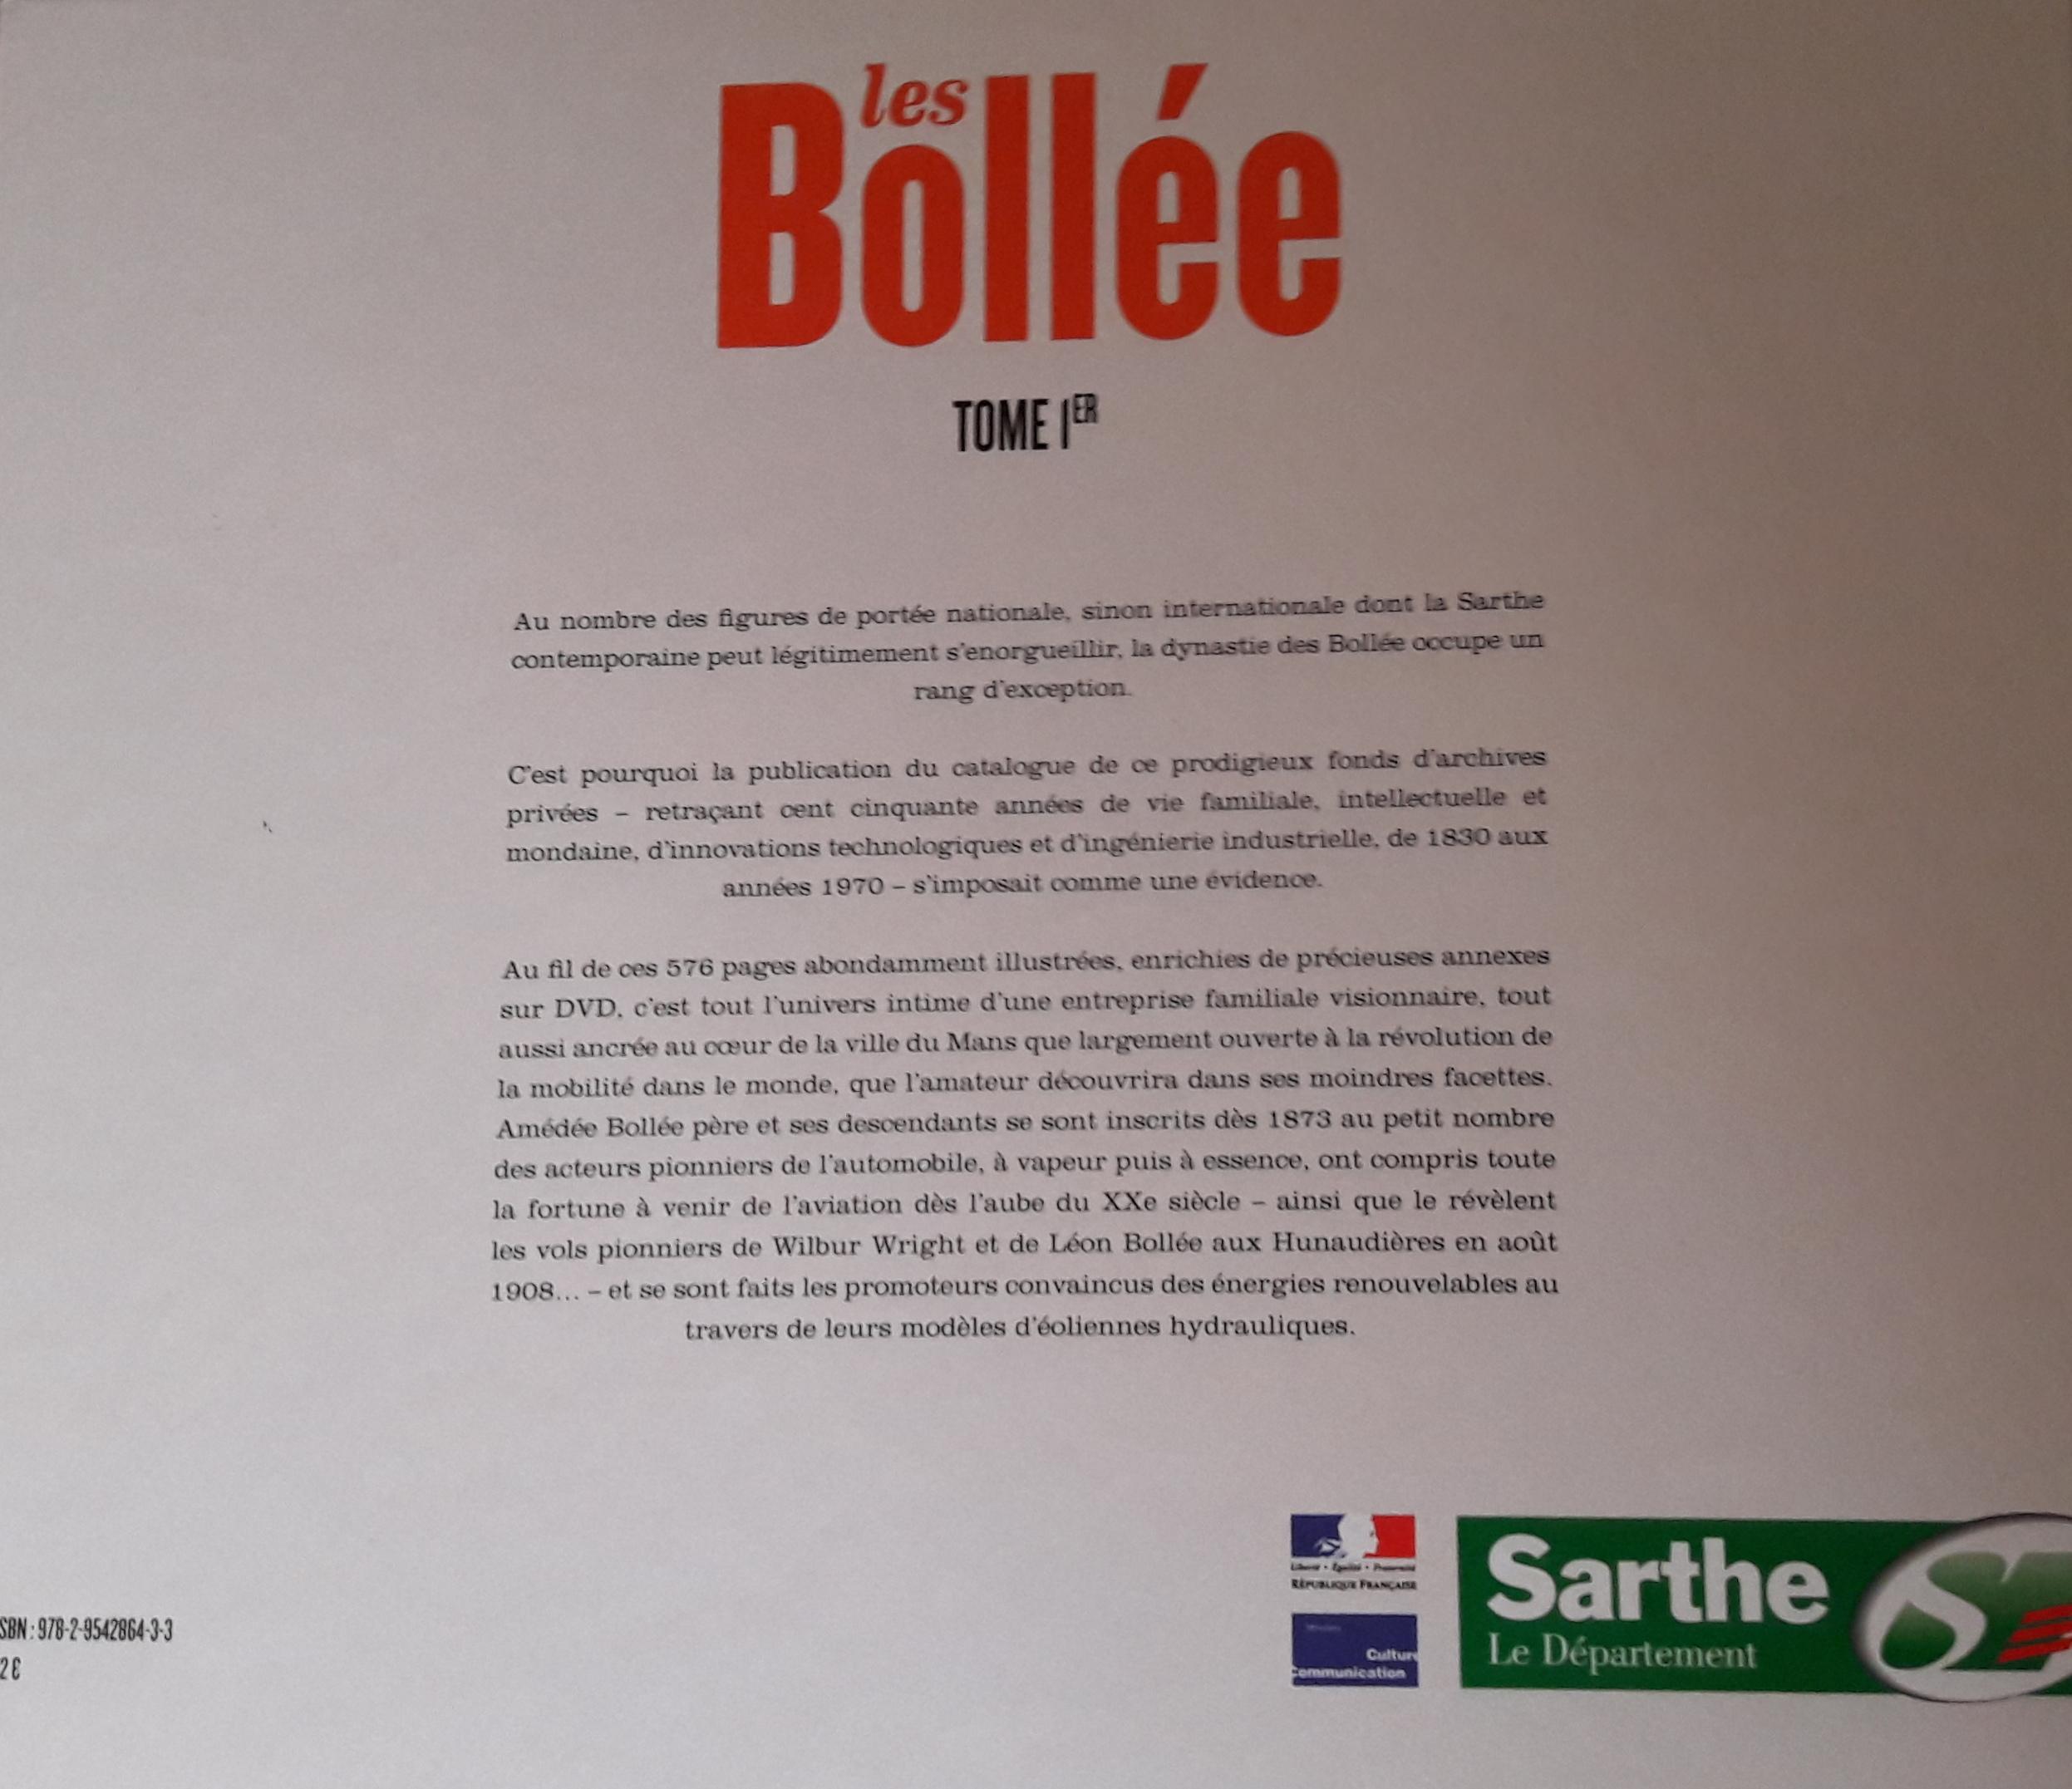 https://www.blog4ever-fichiers.com/2015/02/794874/Coffret-archives-Les-Boll--e-dos-cote.jpg